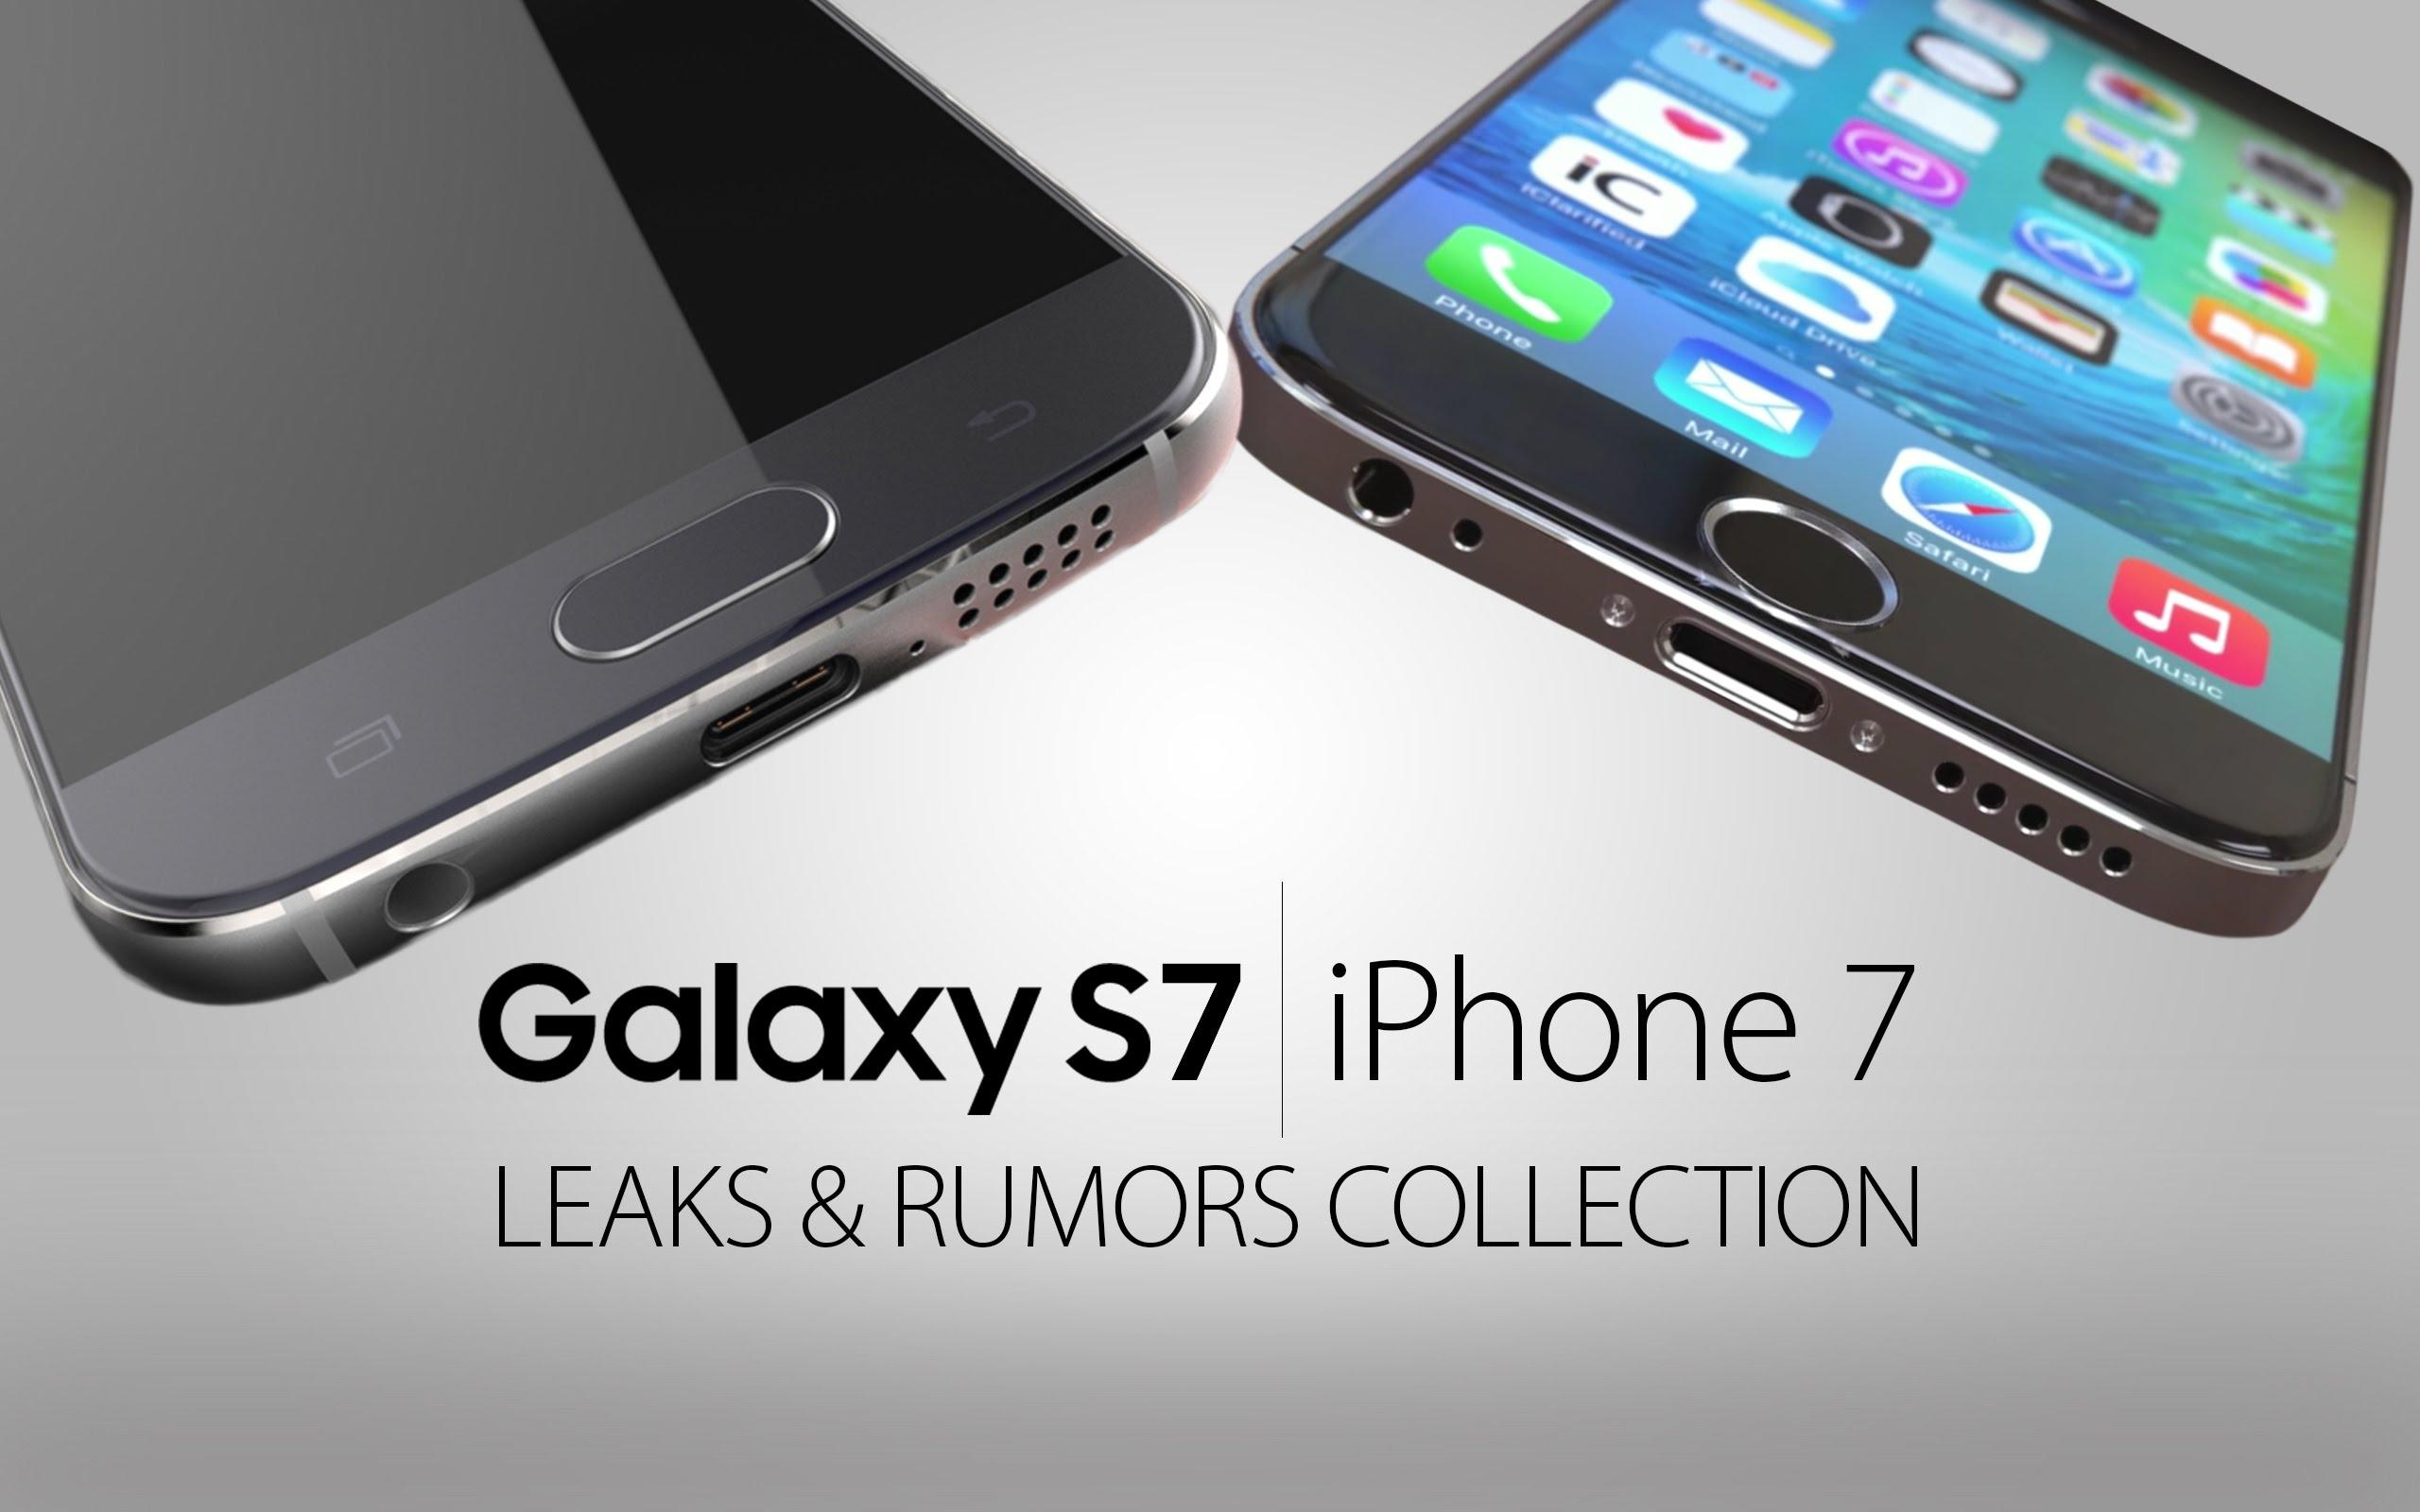 galaxys7iphone7.jpg